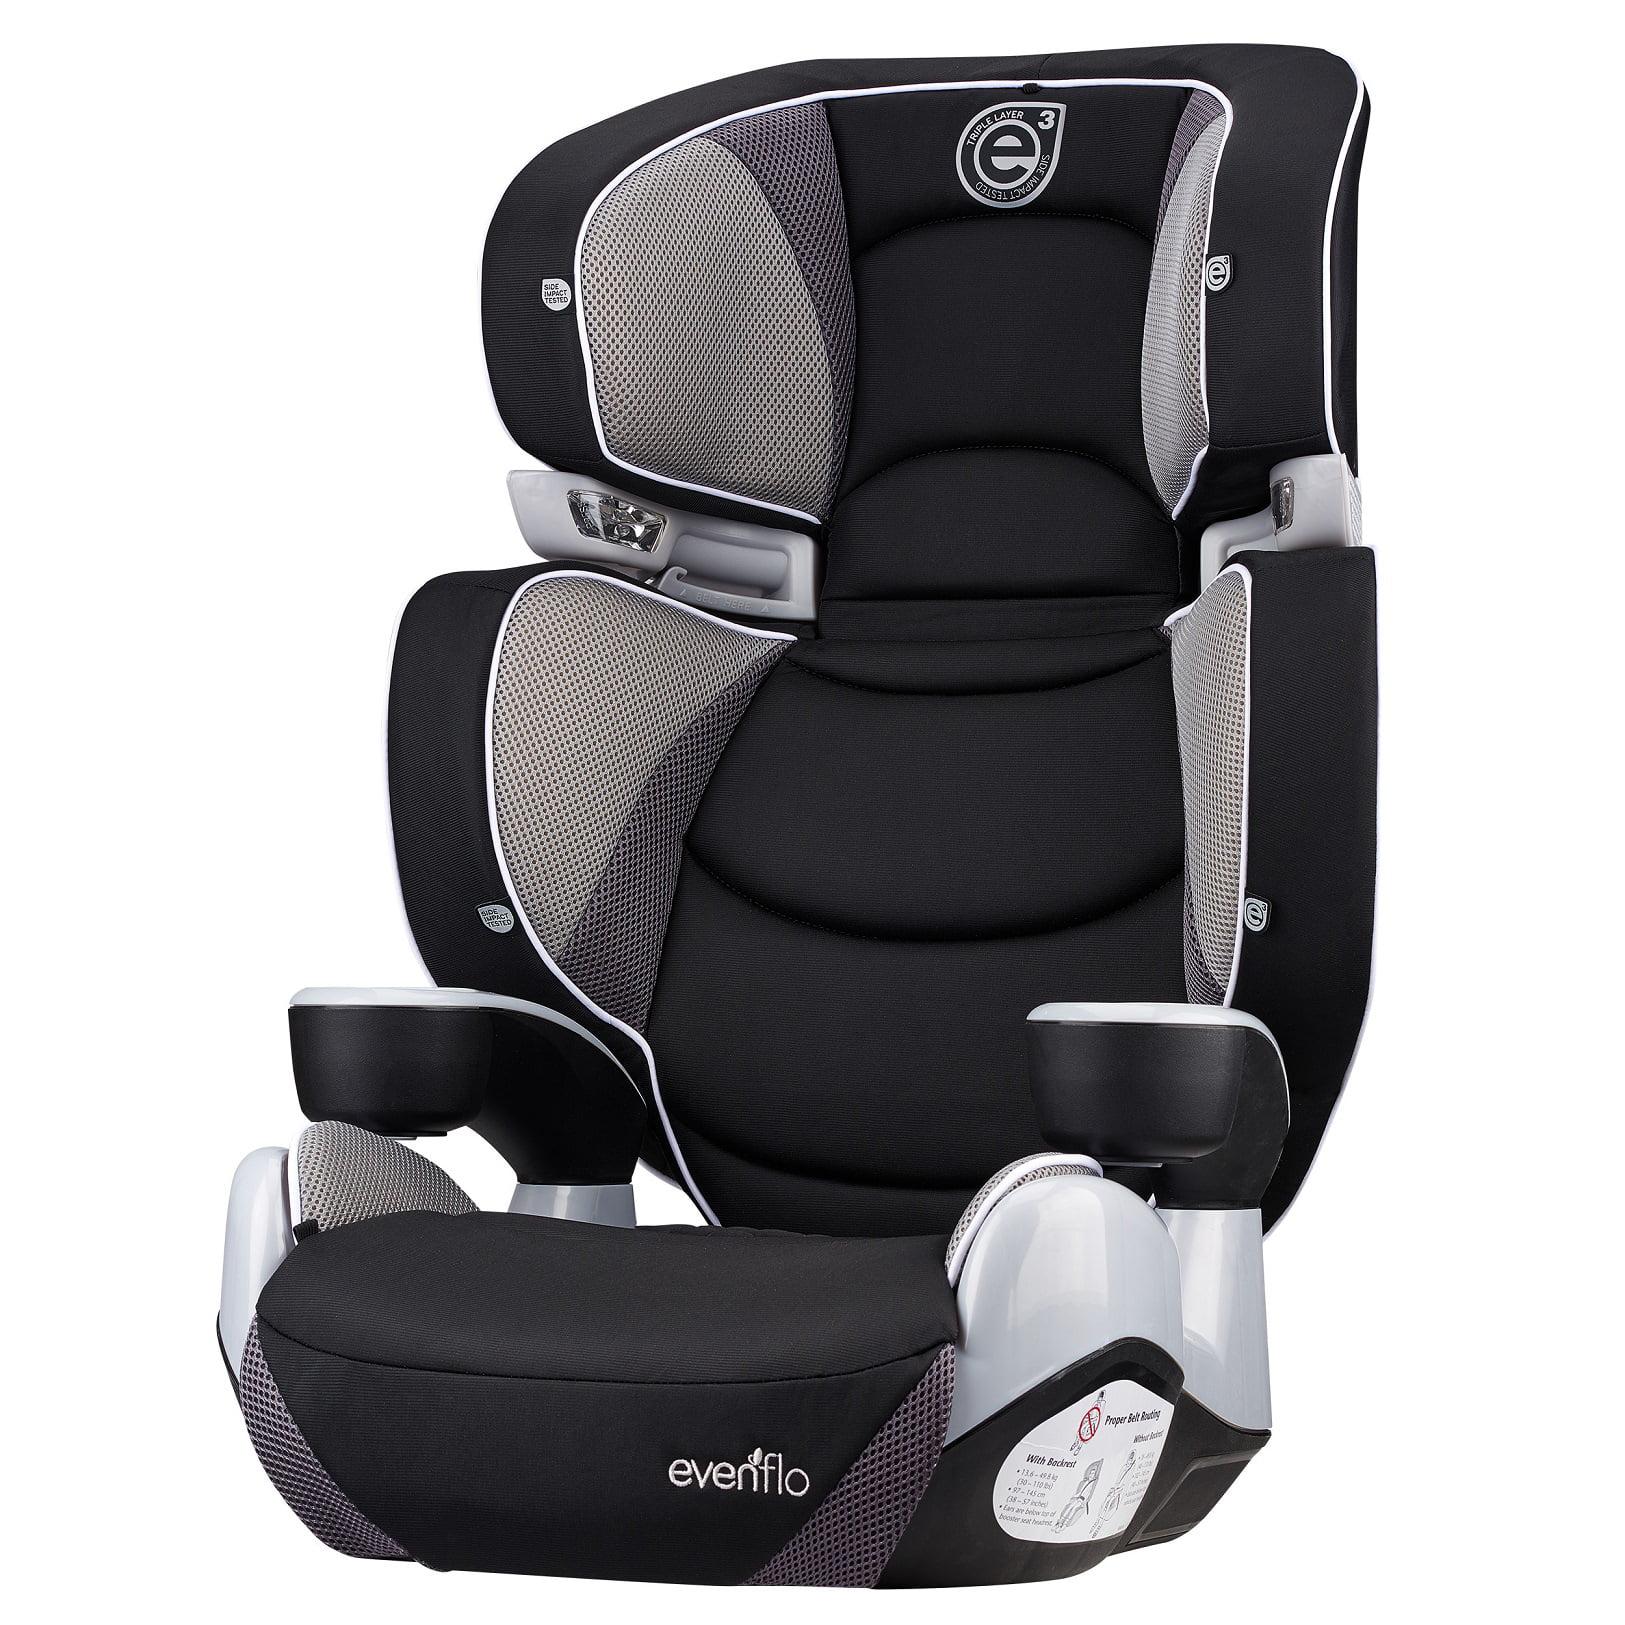 Evenflo Procomfort Rightfit Belt-Positioning Booster Car Seat, Elliot